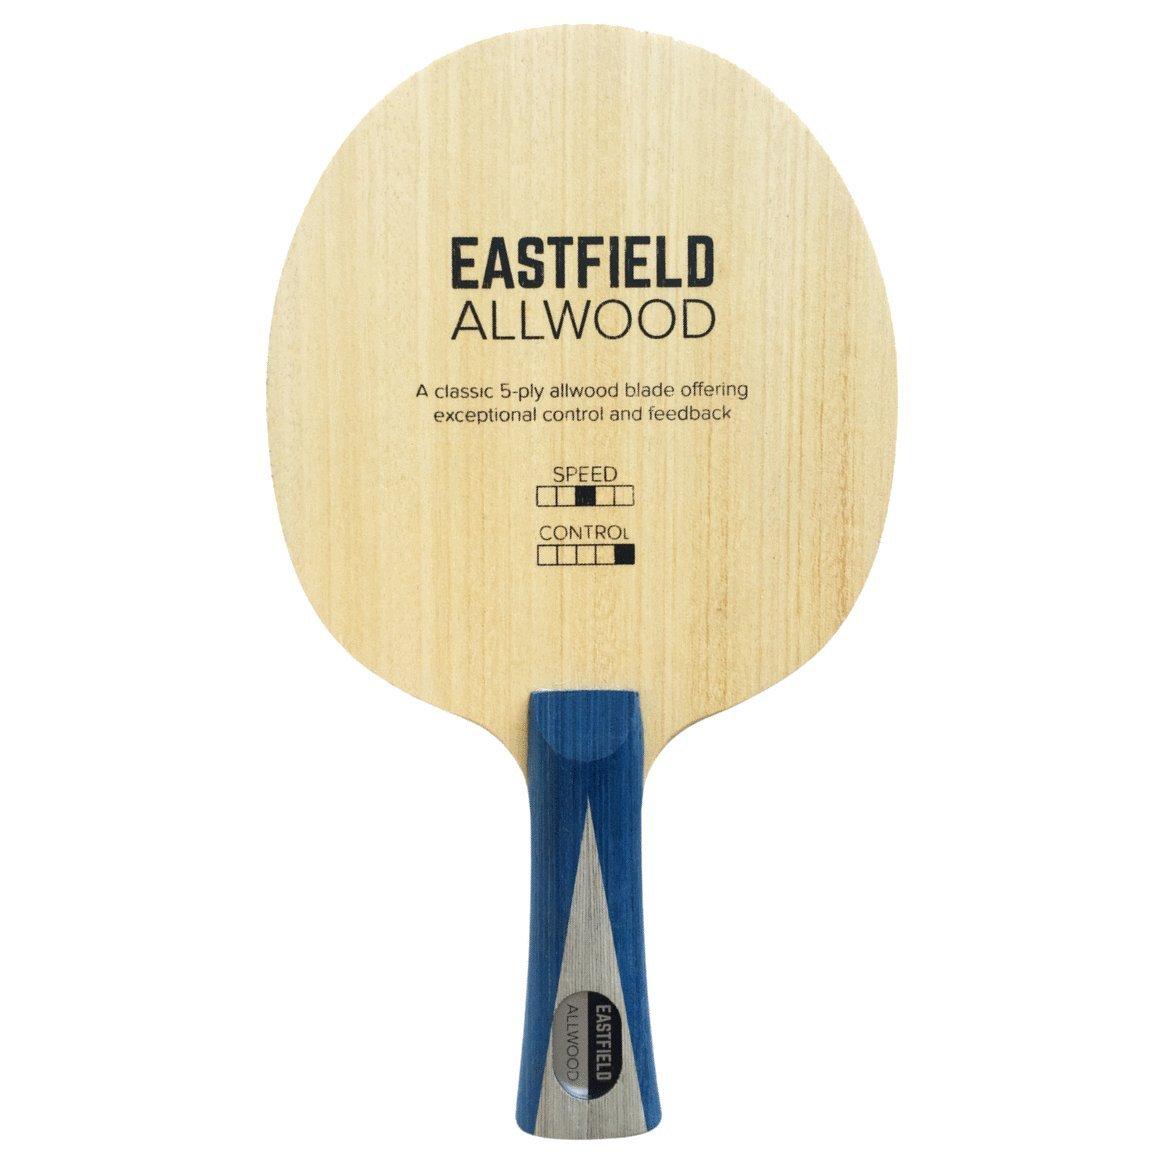 Racchetta da ping pong Eastfield Allwood.